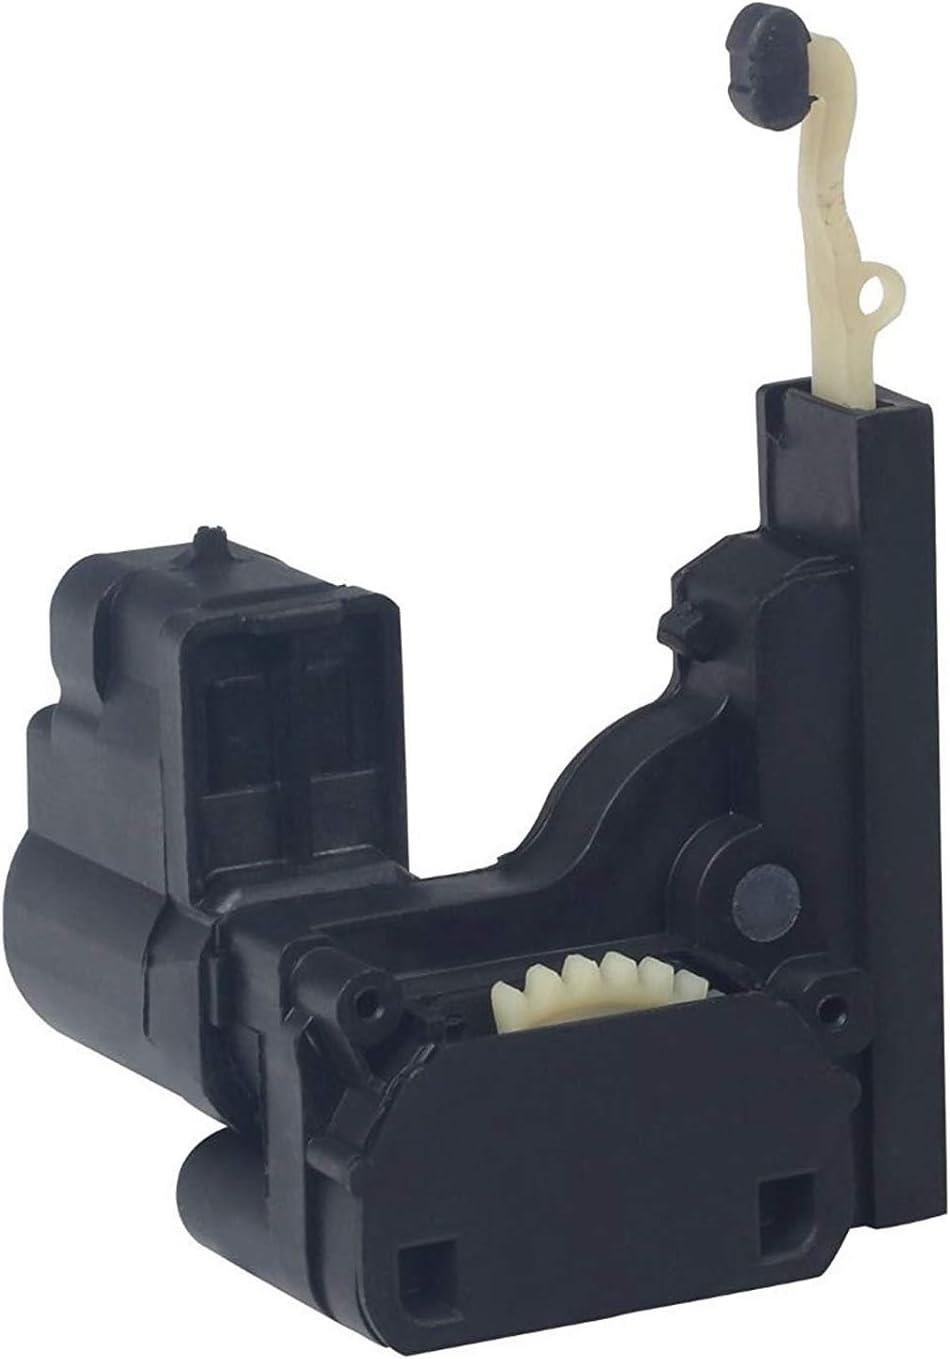 Front Left /& Rear Left Door Lock Actuator Replaces Buick /& Cadillac